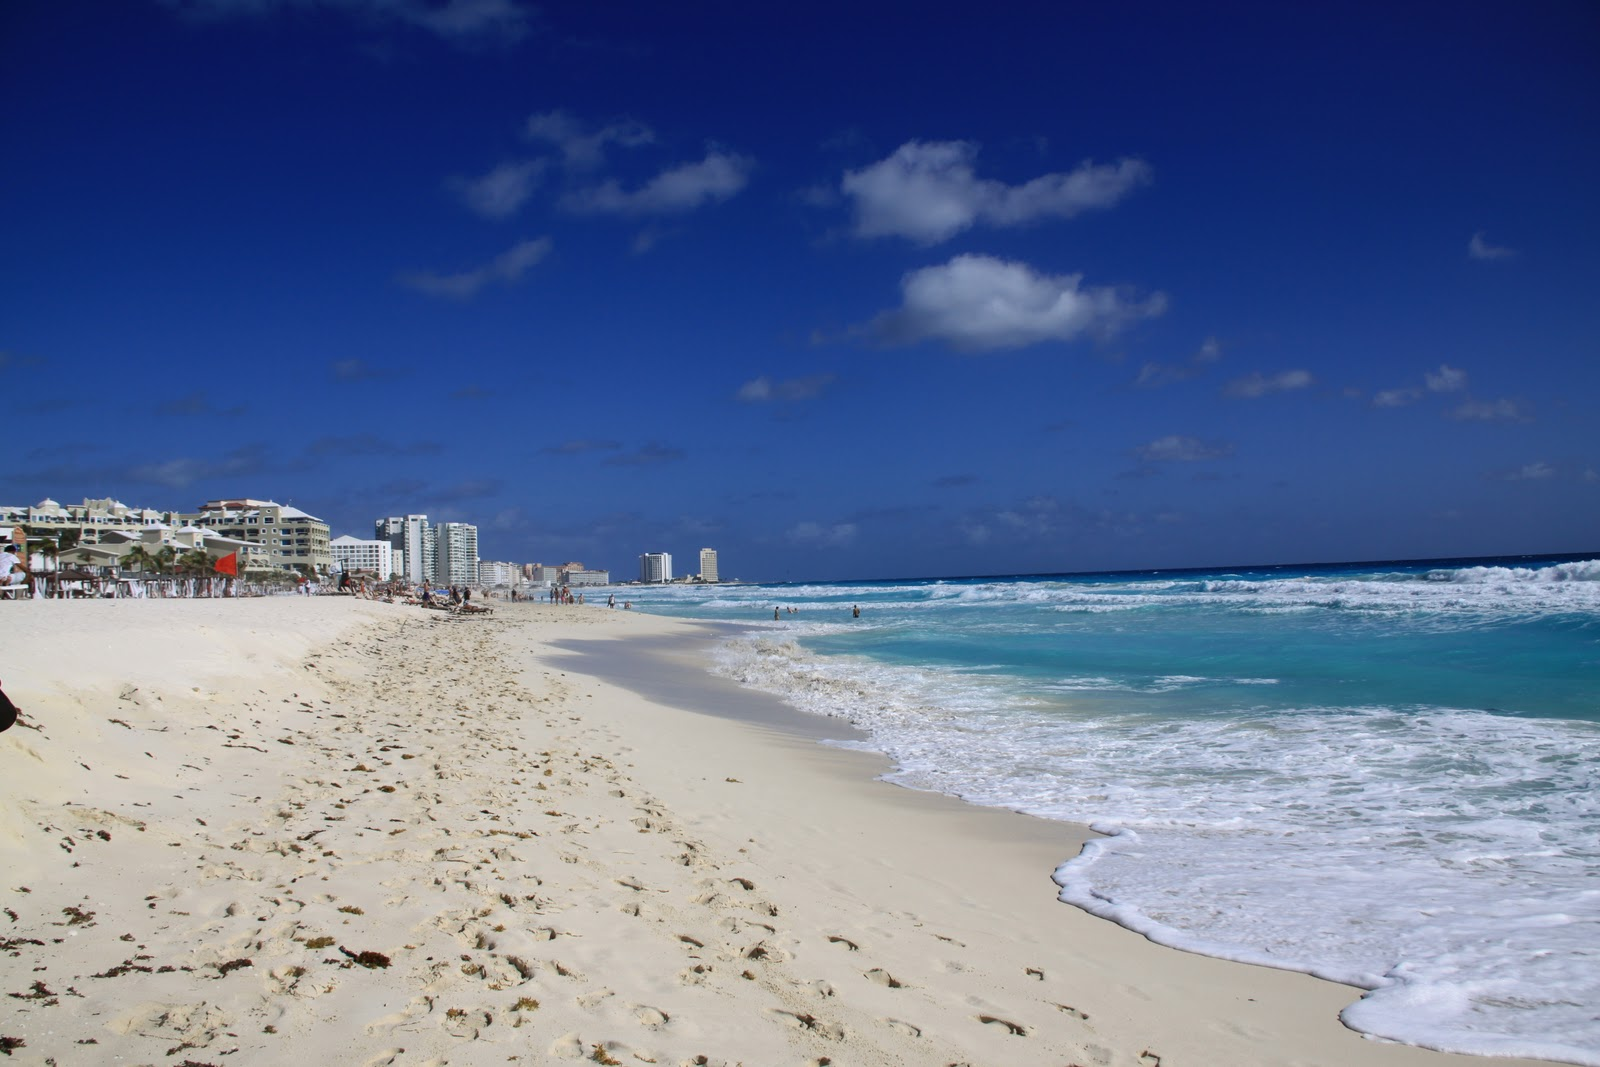 my scenic byway: cancun beach scenes